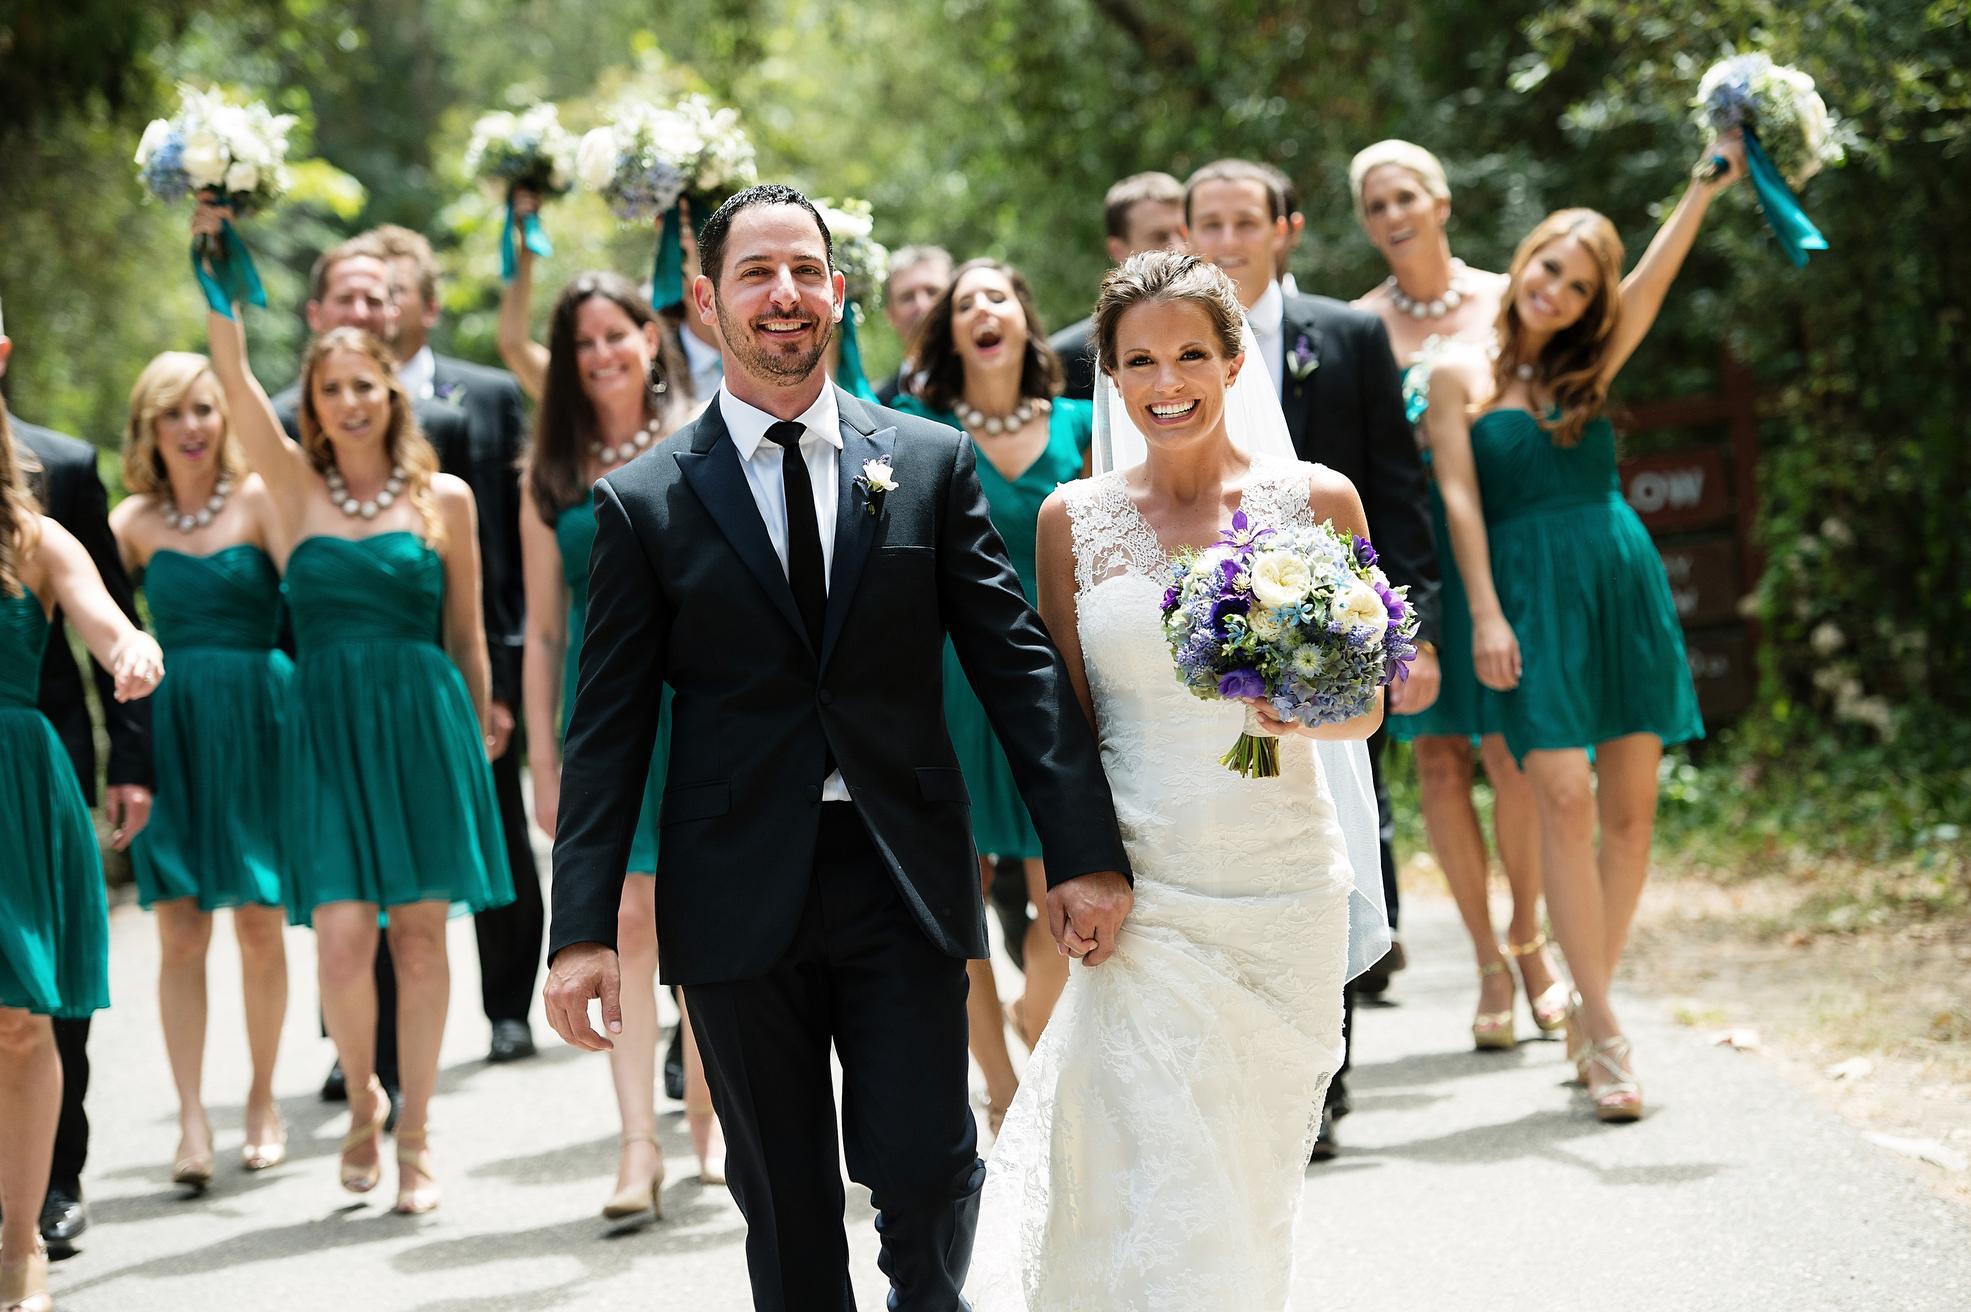 Melissa Claire Egan Wedding Dress Images